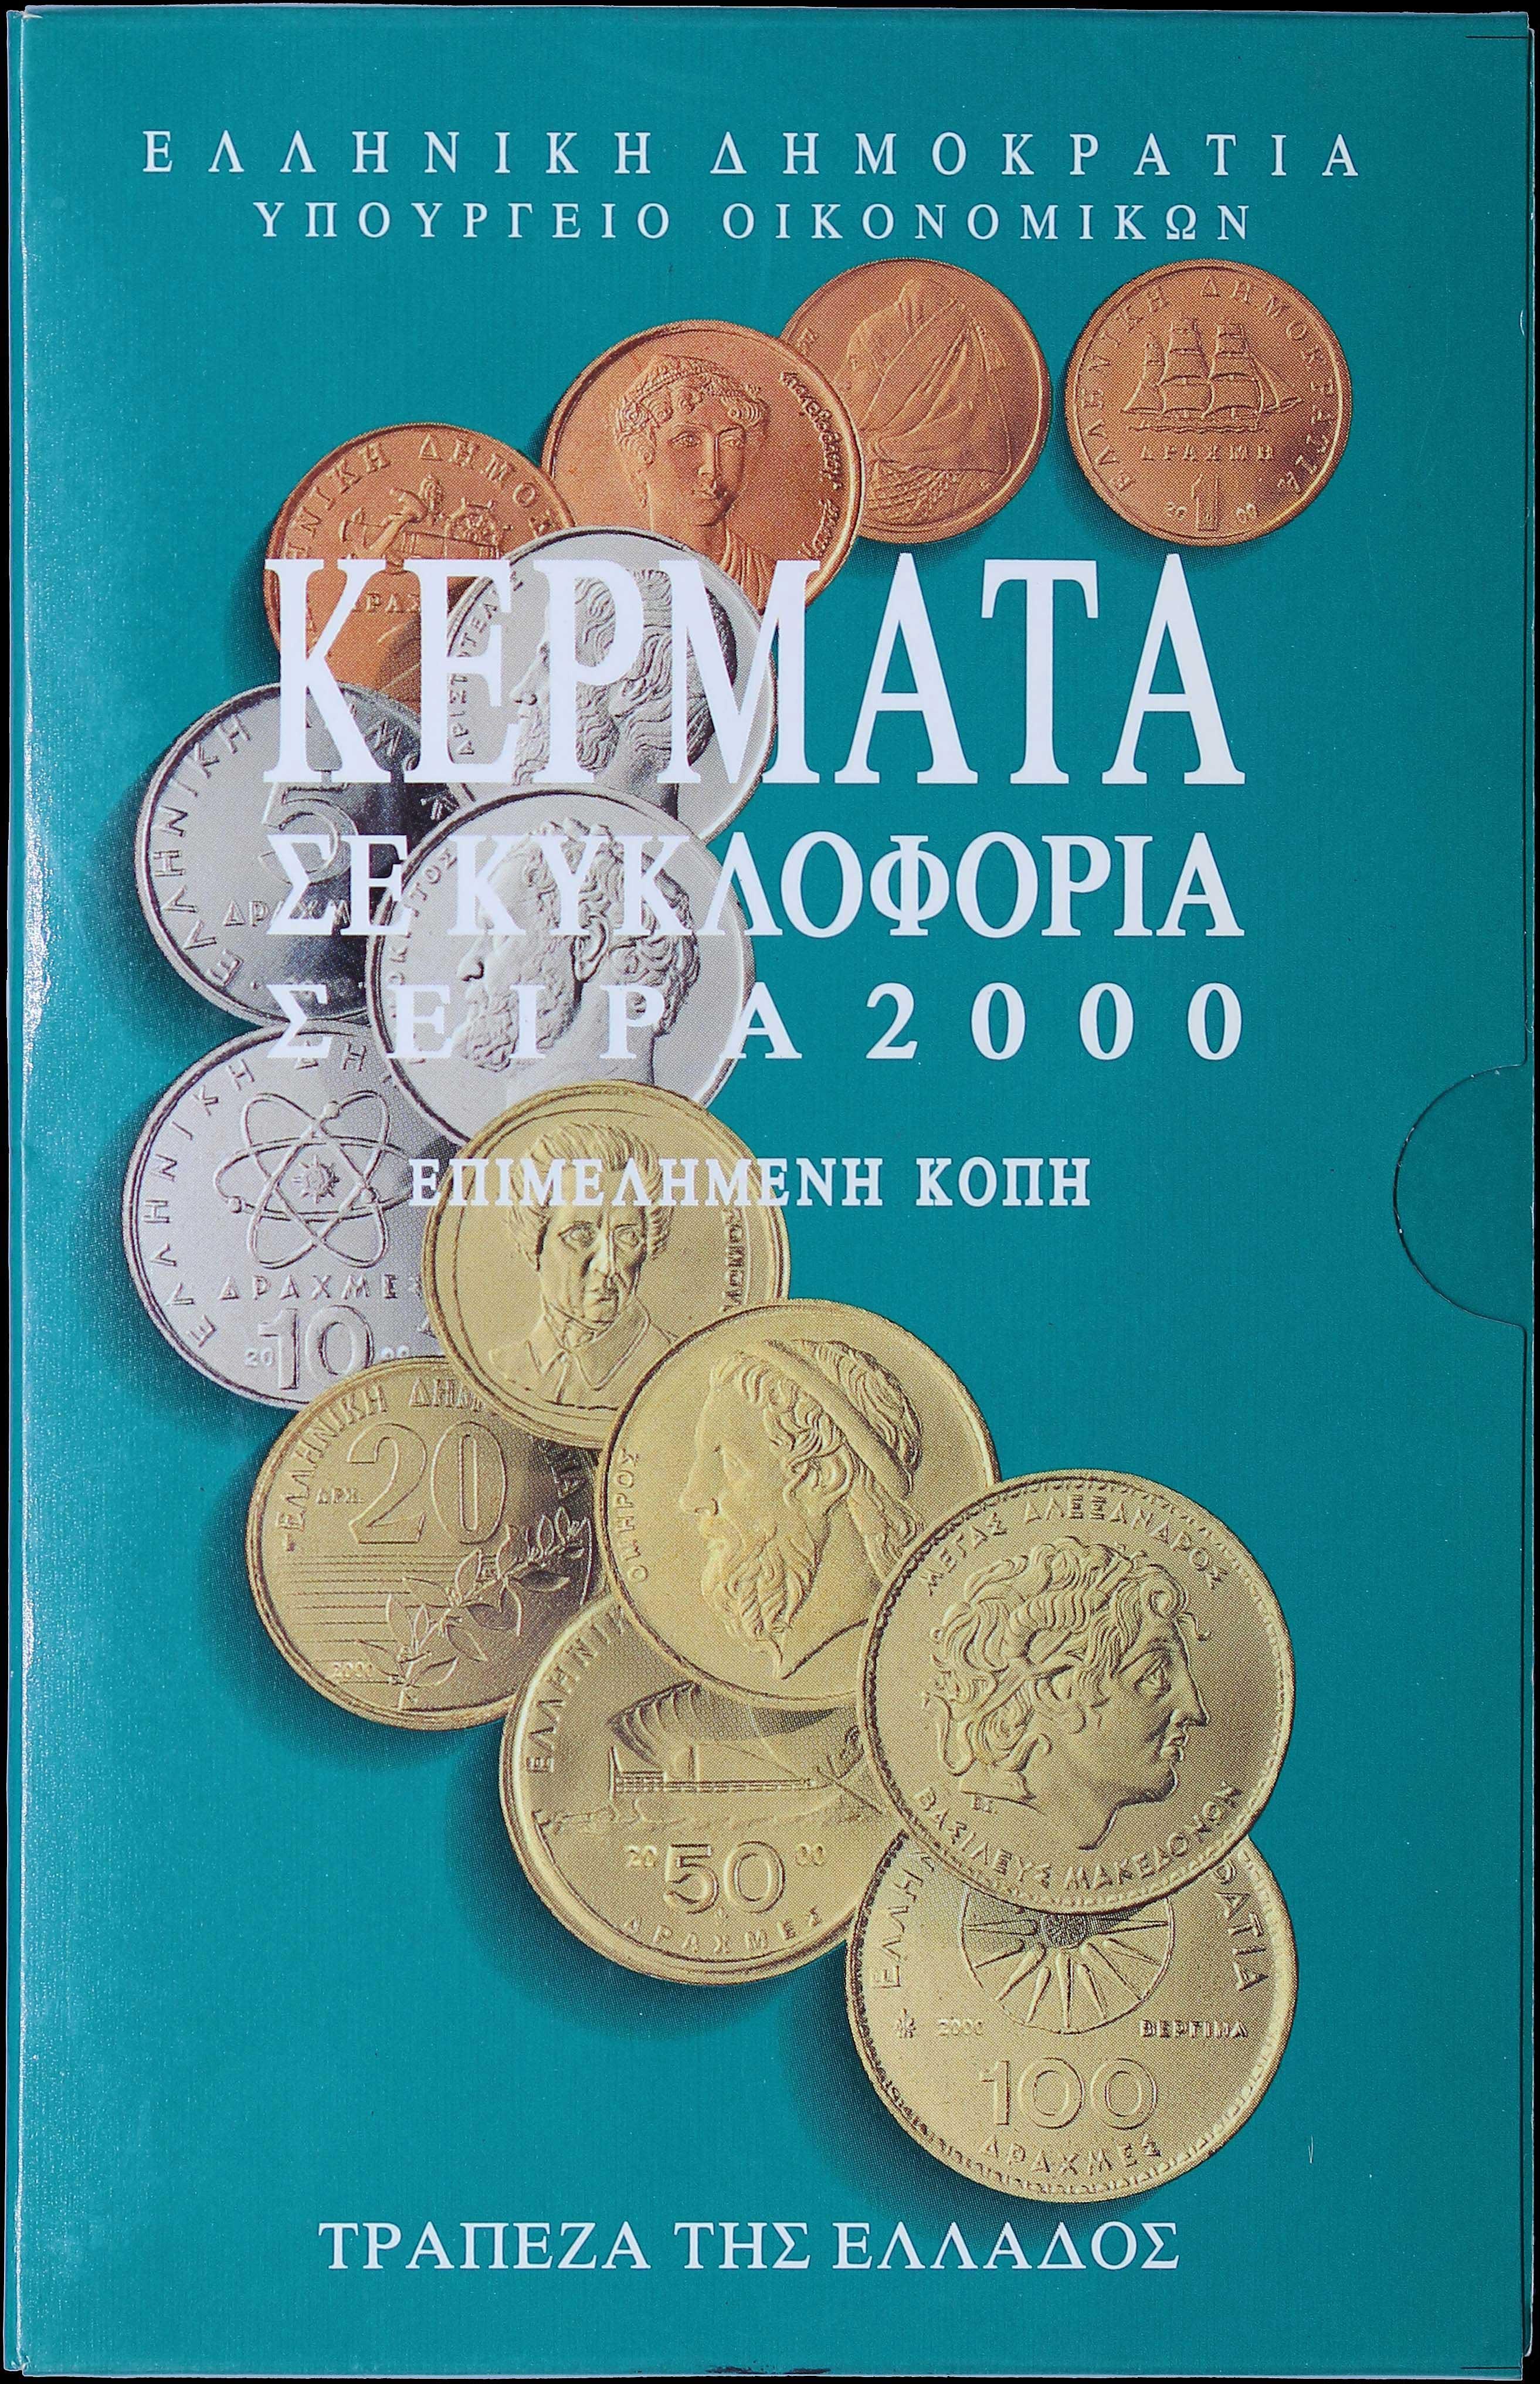 Lot 6242 - -  COINS & TOKENS HELLENIC REPUBLIC & COMMEMORATIVE ISSUES -  A. Karamitsos Public & Live Internet Auction 682 (Part A) Coins, Medals & Banknotes